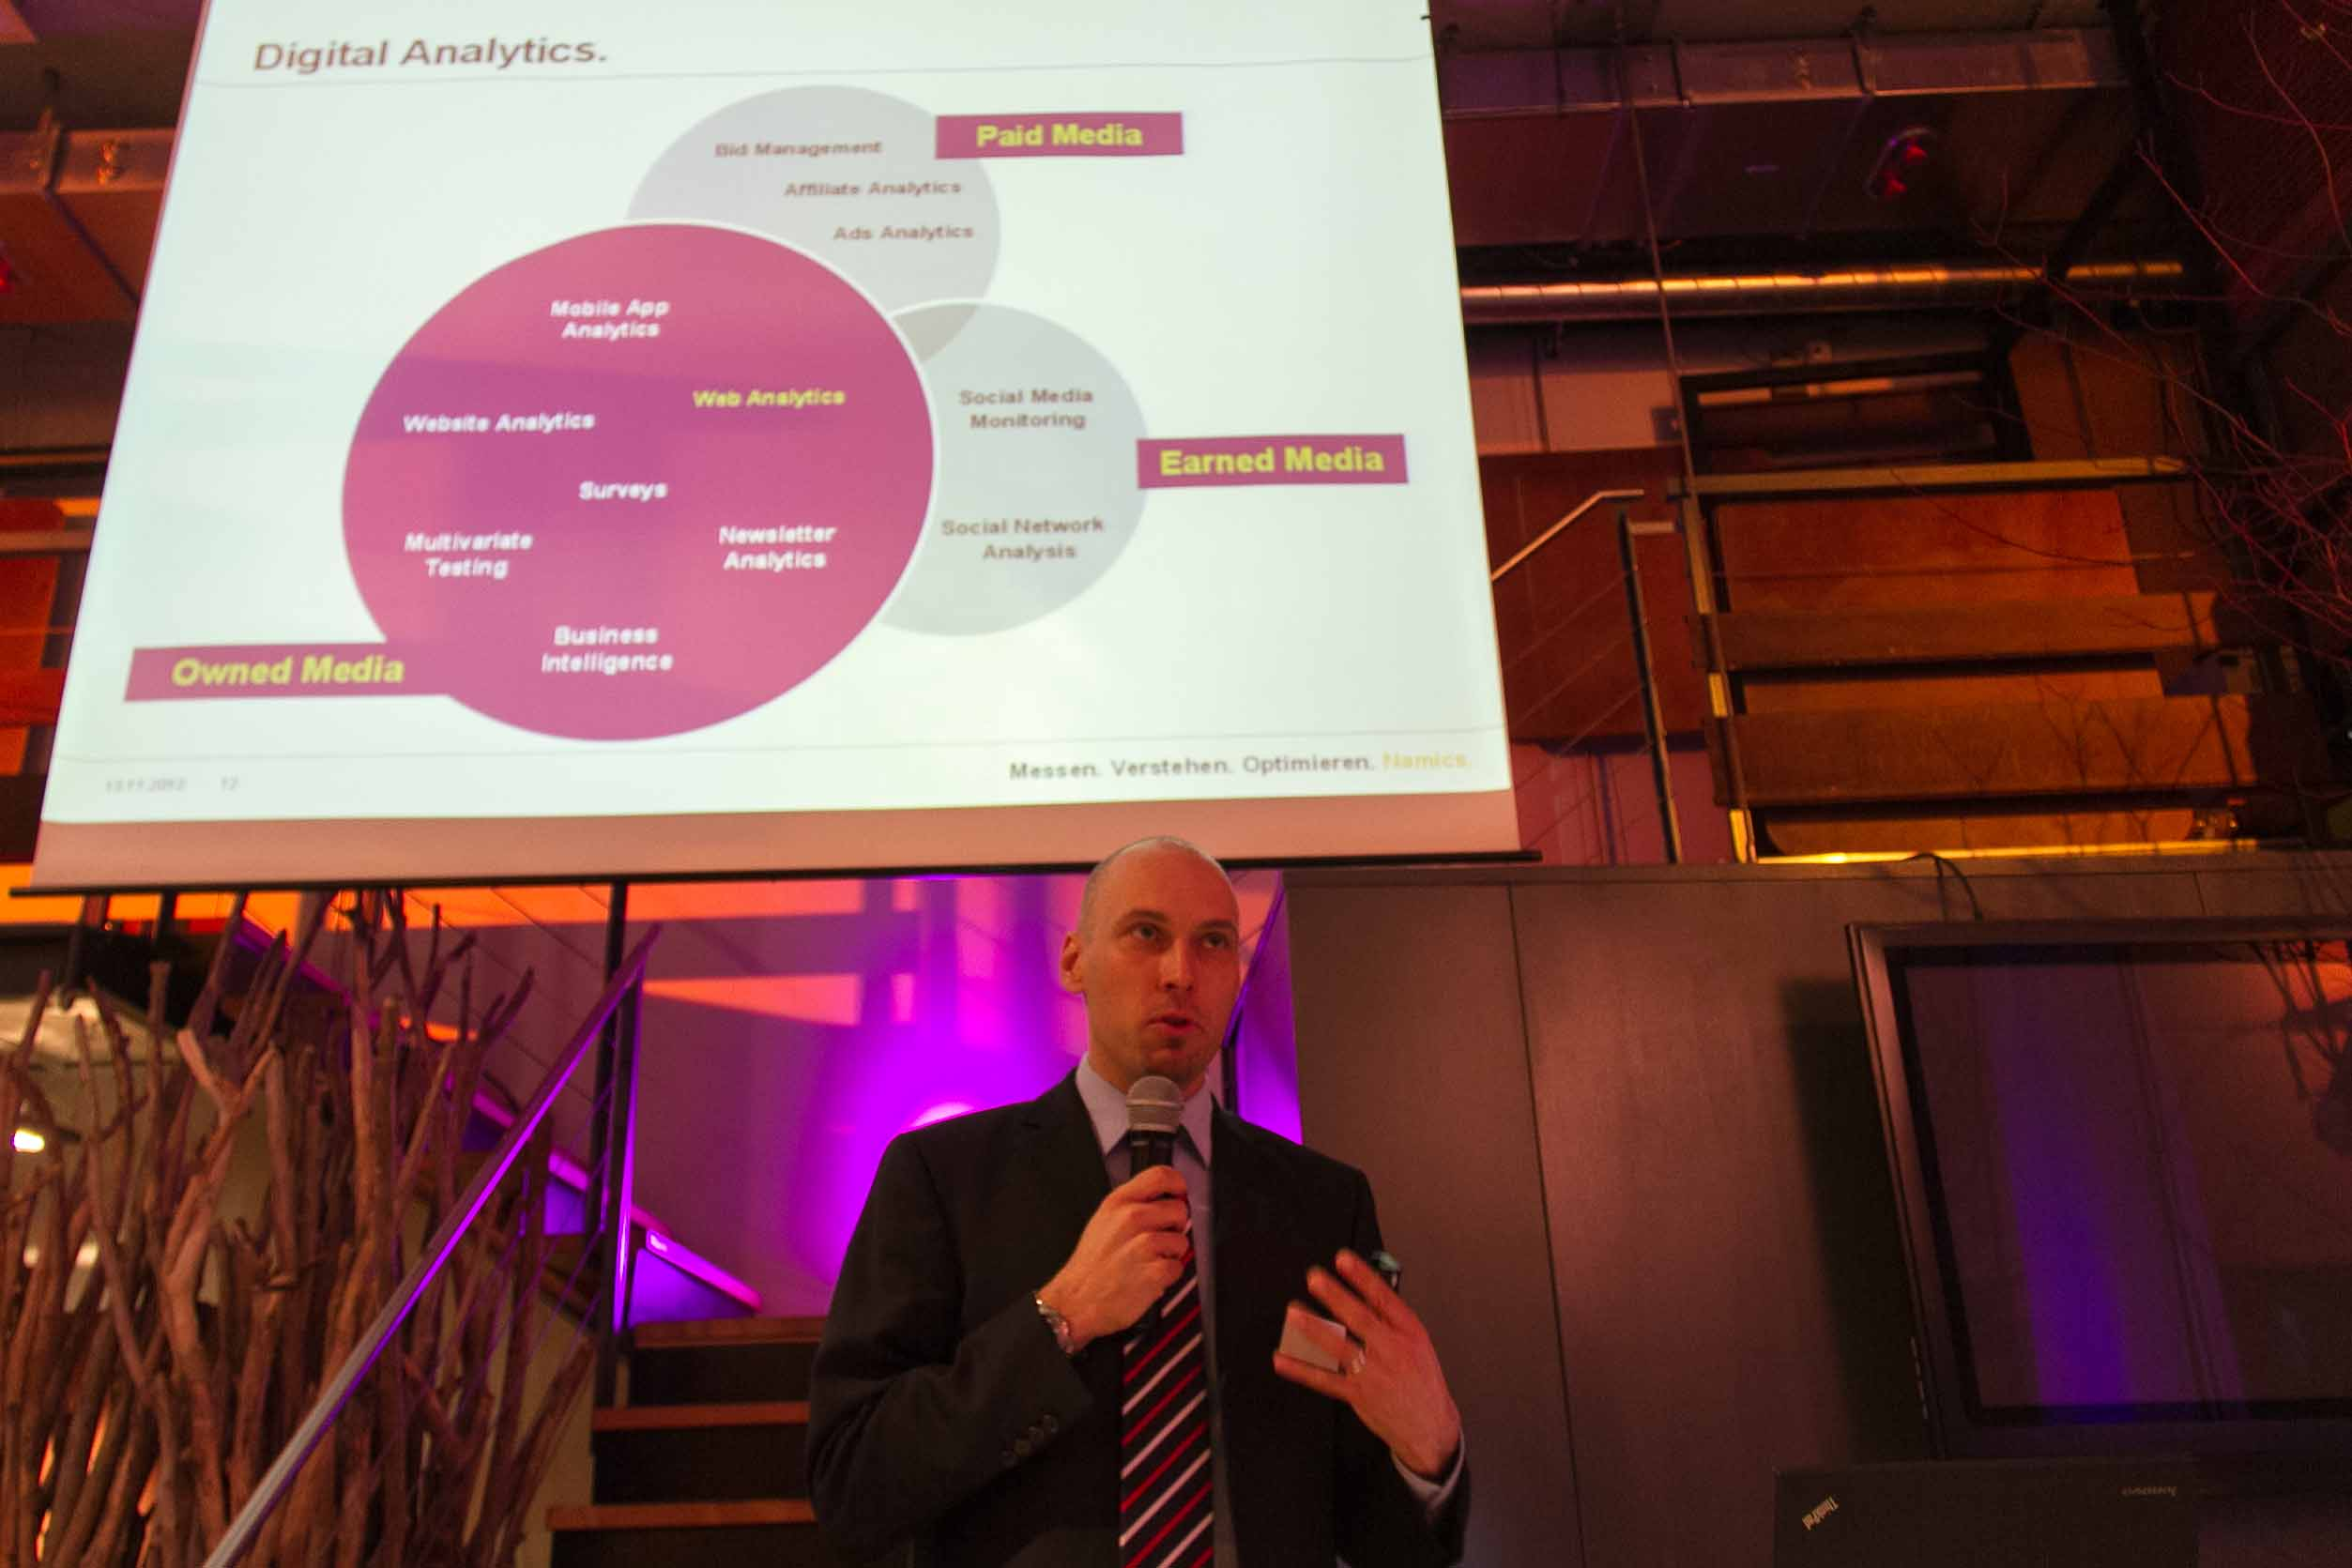 Digital-Analytics-Marco-Hassler-Namics-Vortrag-SIMSA-Late-Afternoon-Talk